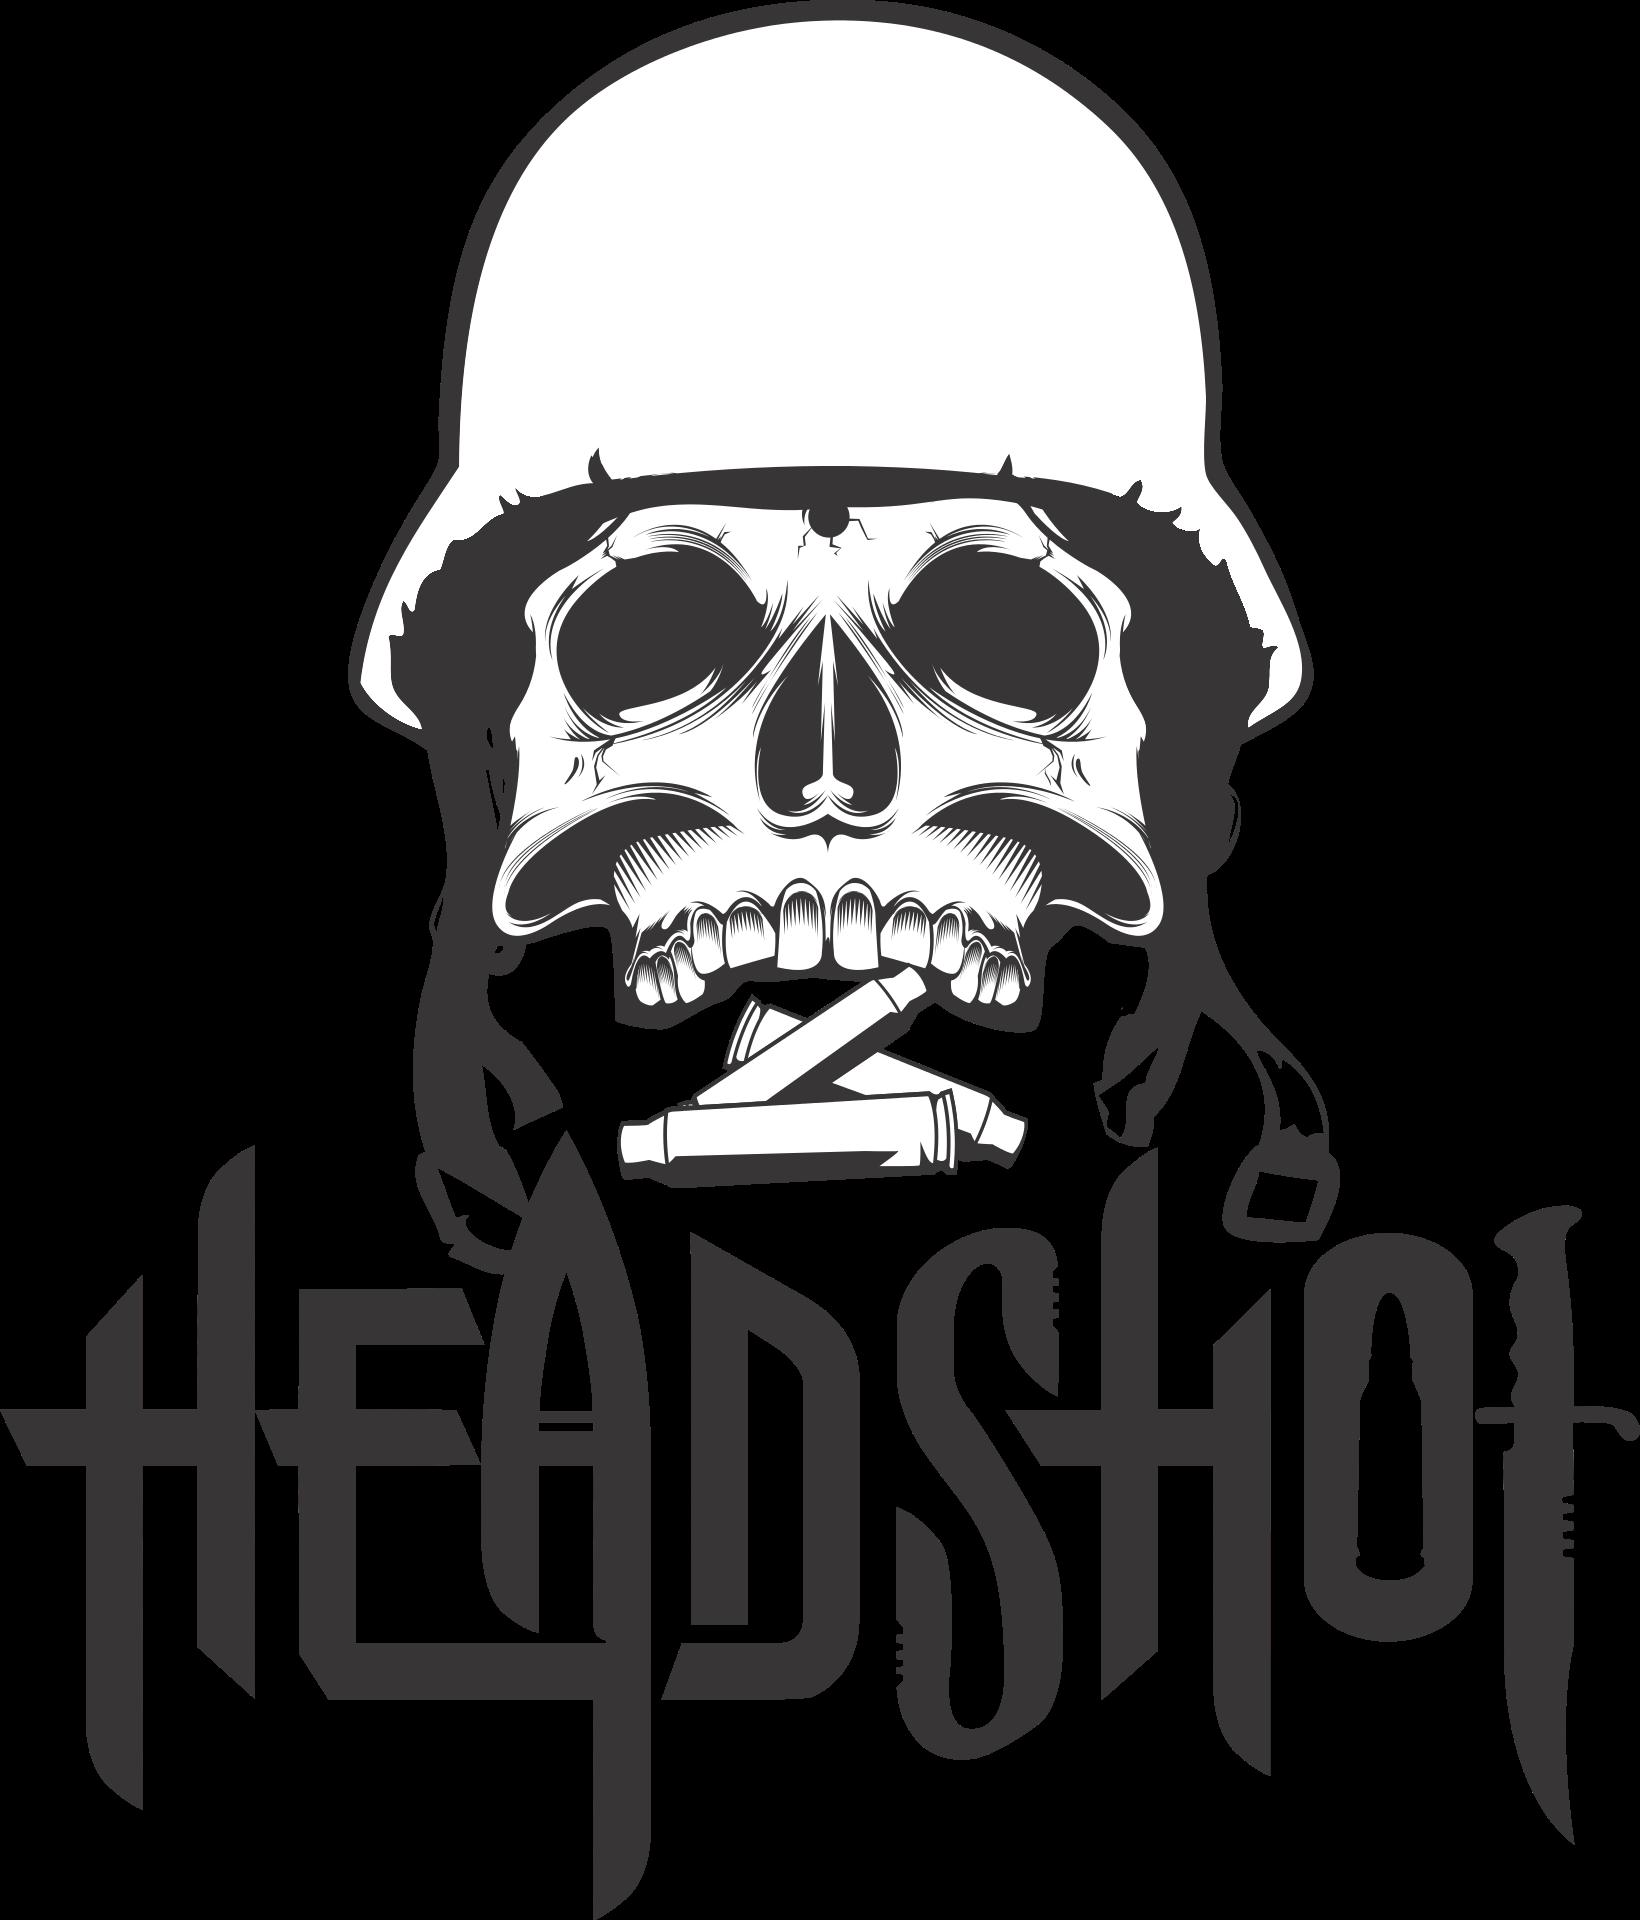 HeadShot Illustration, Art, Graphic, Graphical, Headshot, HQ Photo